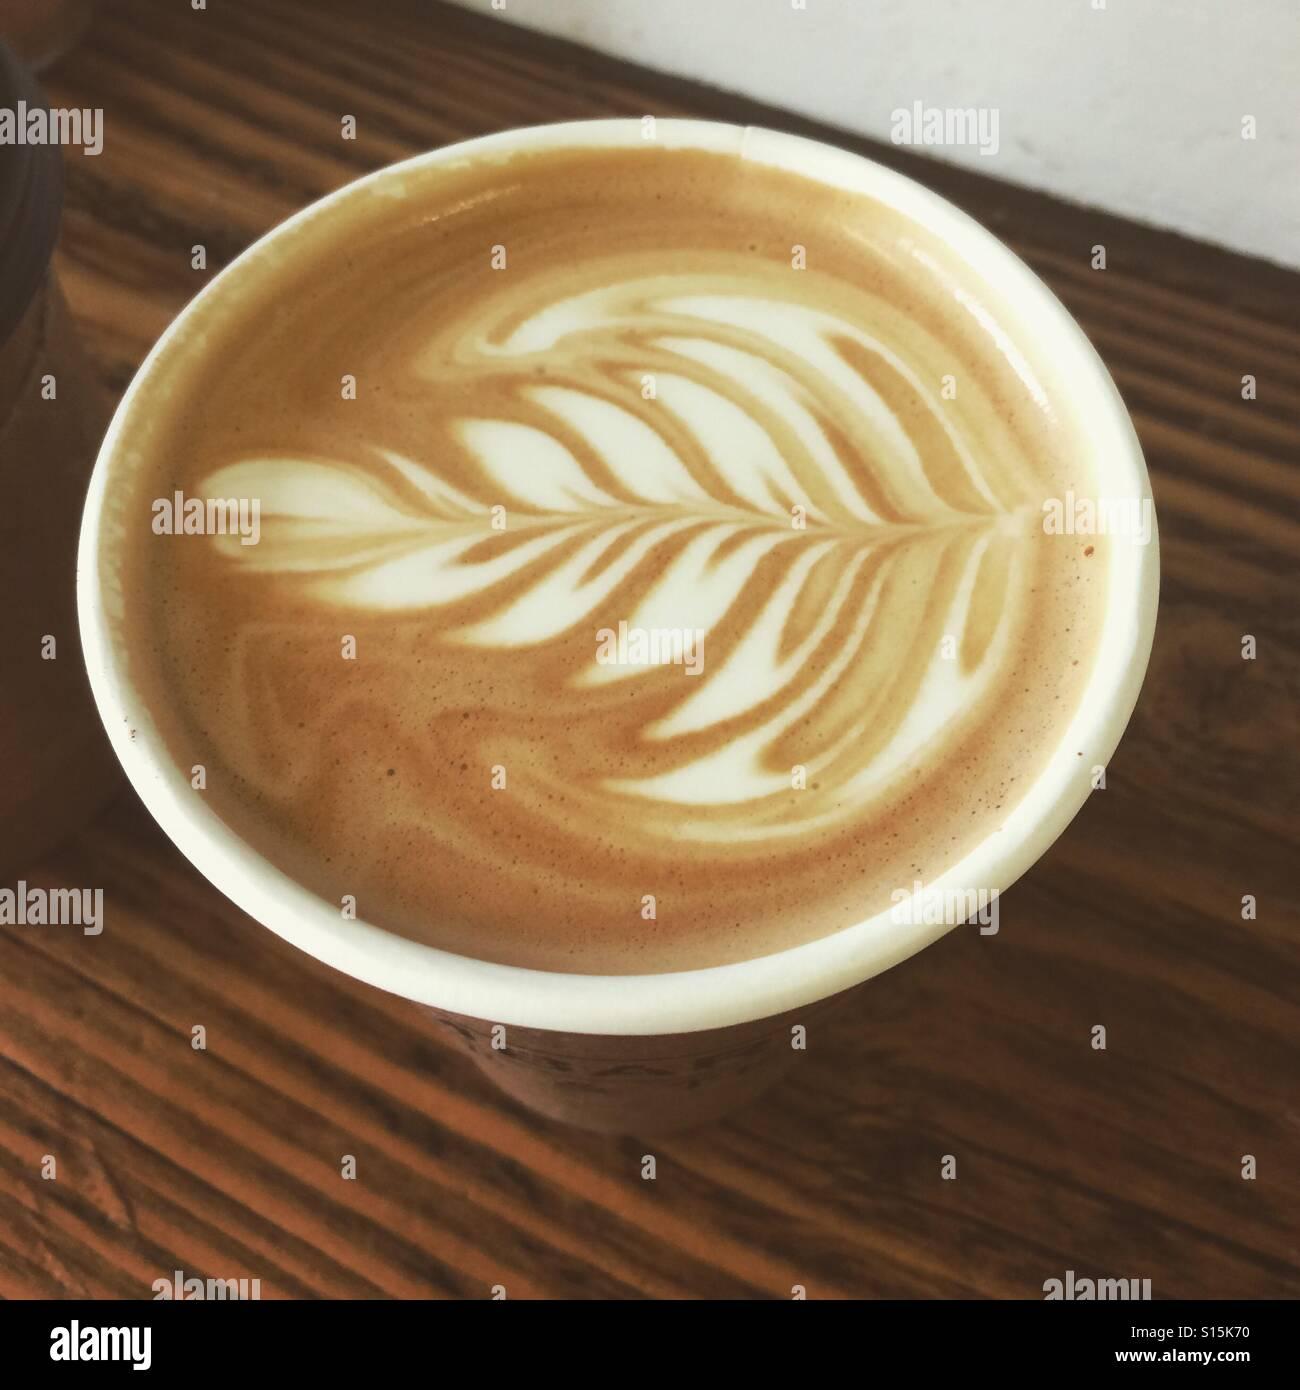 4c8e54c7401 Fancy Coffee Stock Photos & Fancy Coffee Stock Images - Alamy